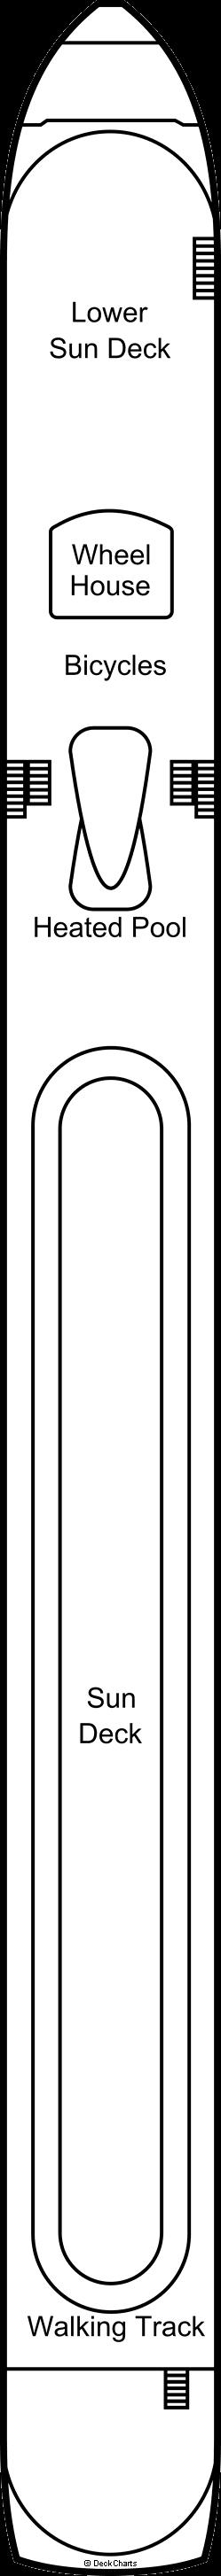 AmaStella: Sun Deck